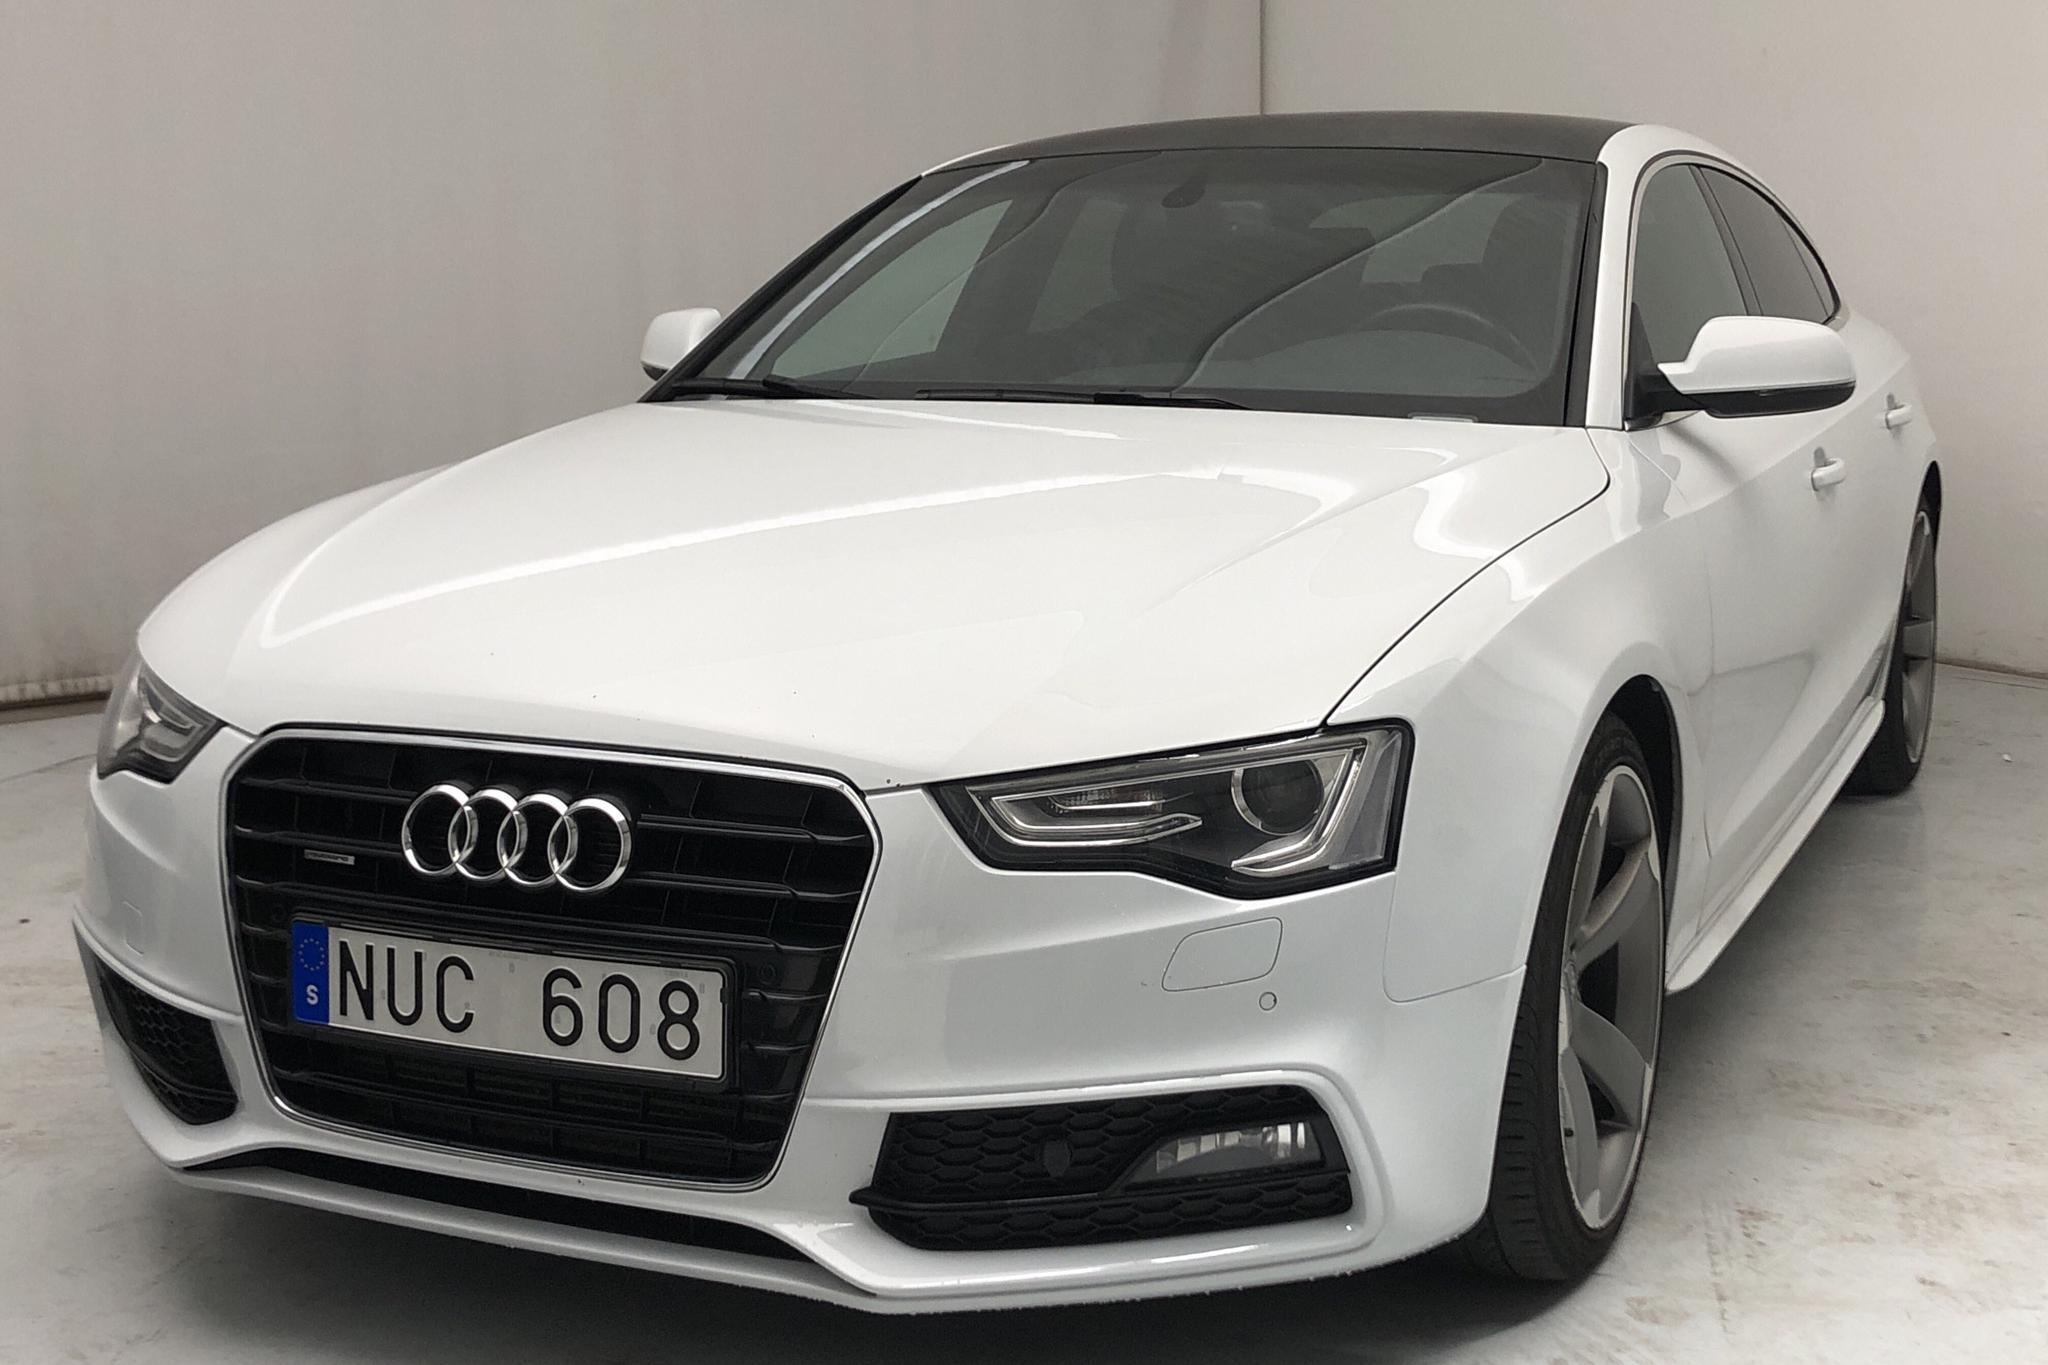 Audi A5 2.0 TFSI Sportback quattro (211hk) - 100 550 km - Automatic - white - 2012